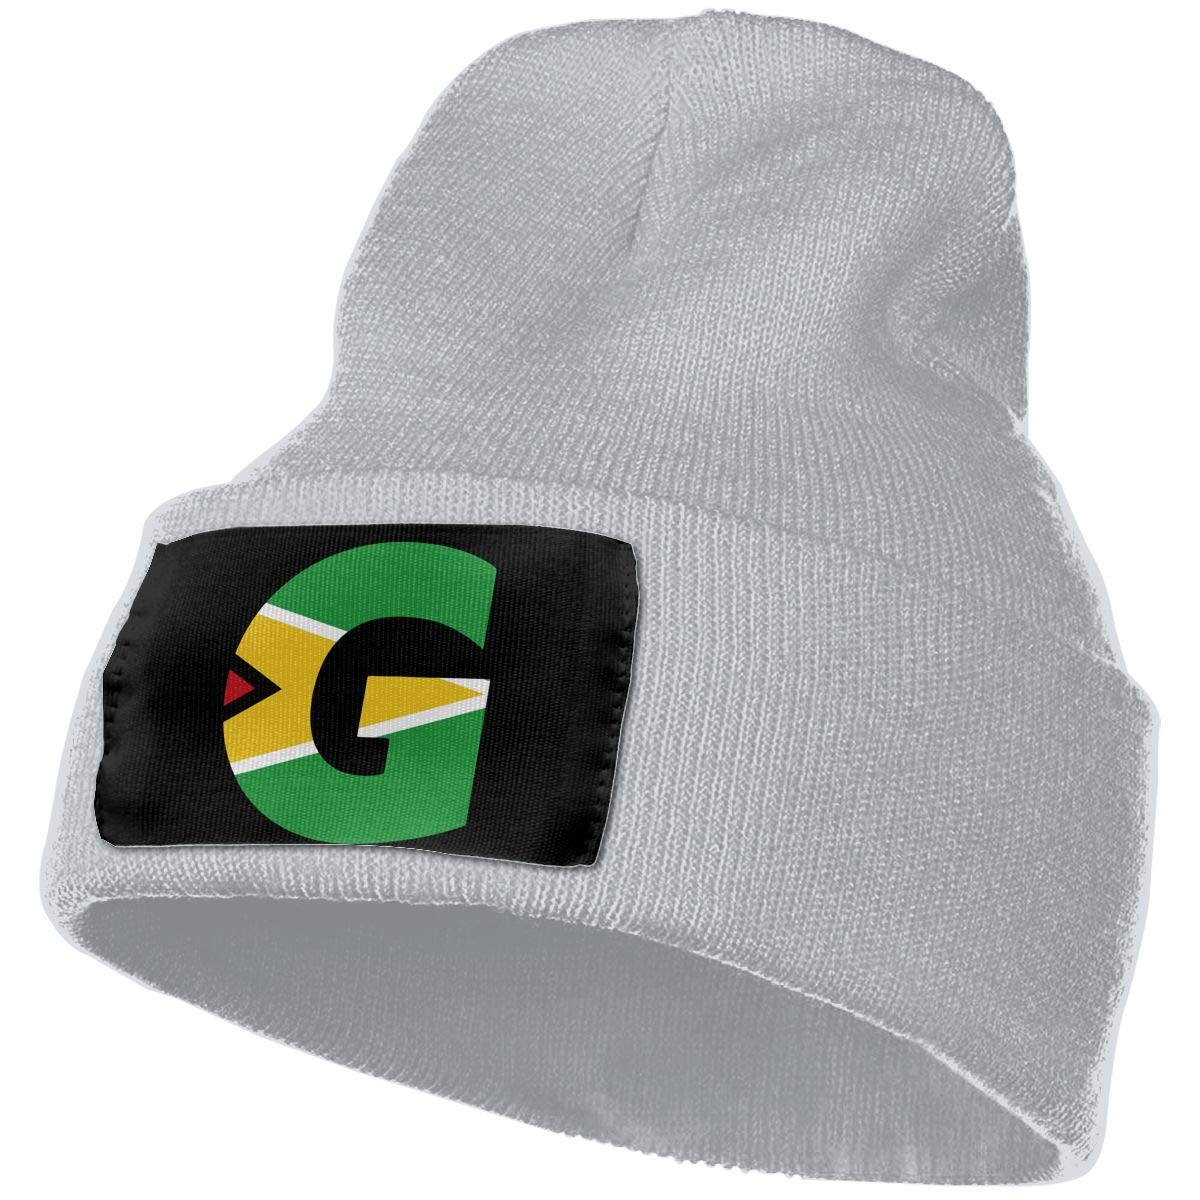 QZqDQ Guyana Flag G Letter Unisex Fashion Knitted Hat Luxury Hip-Hop Cap